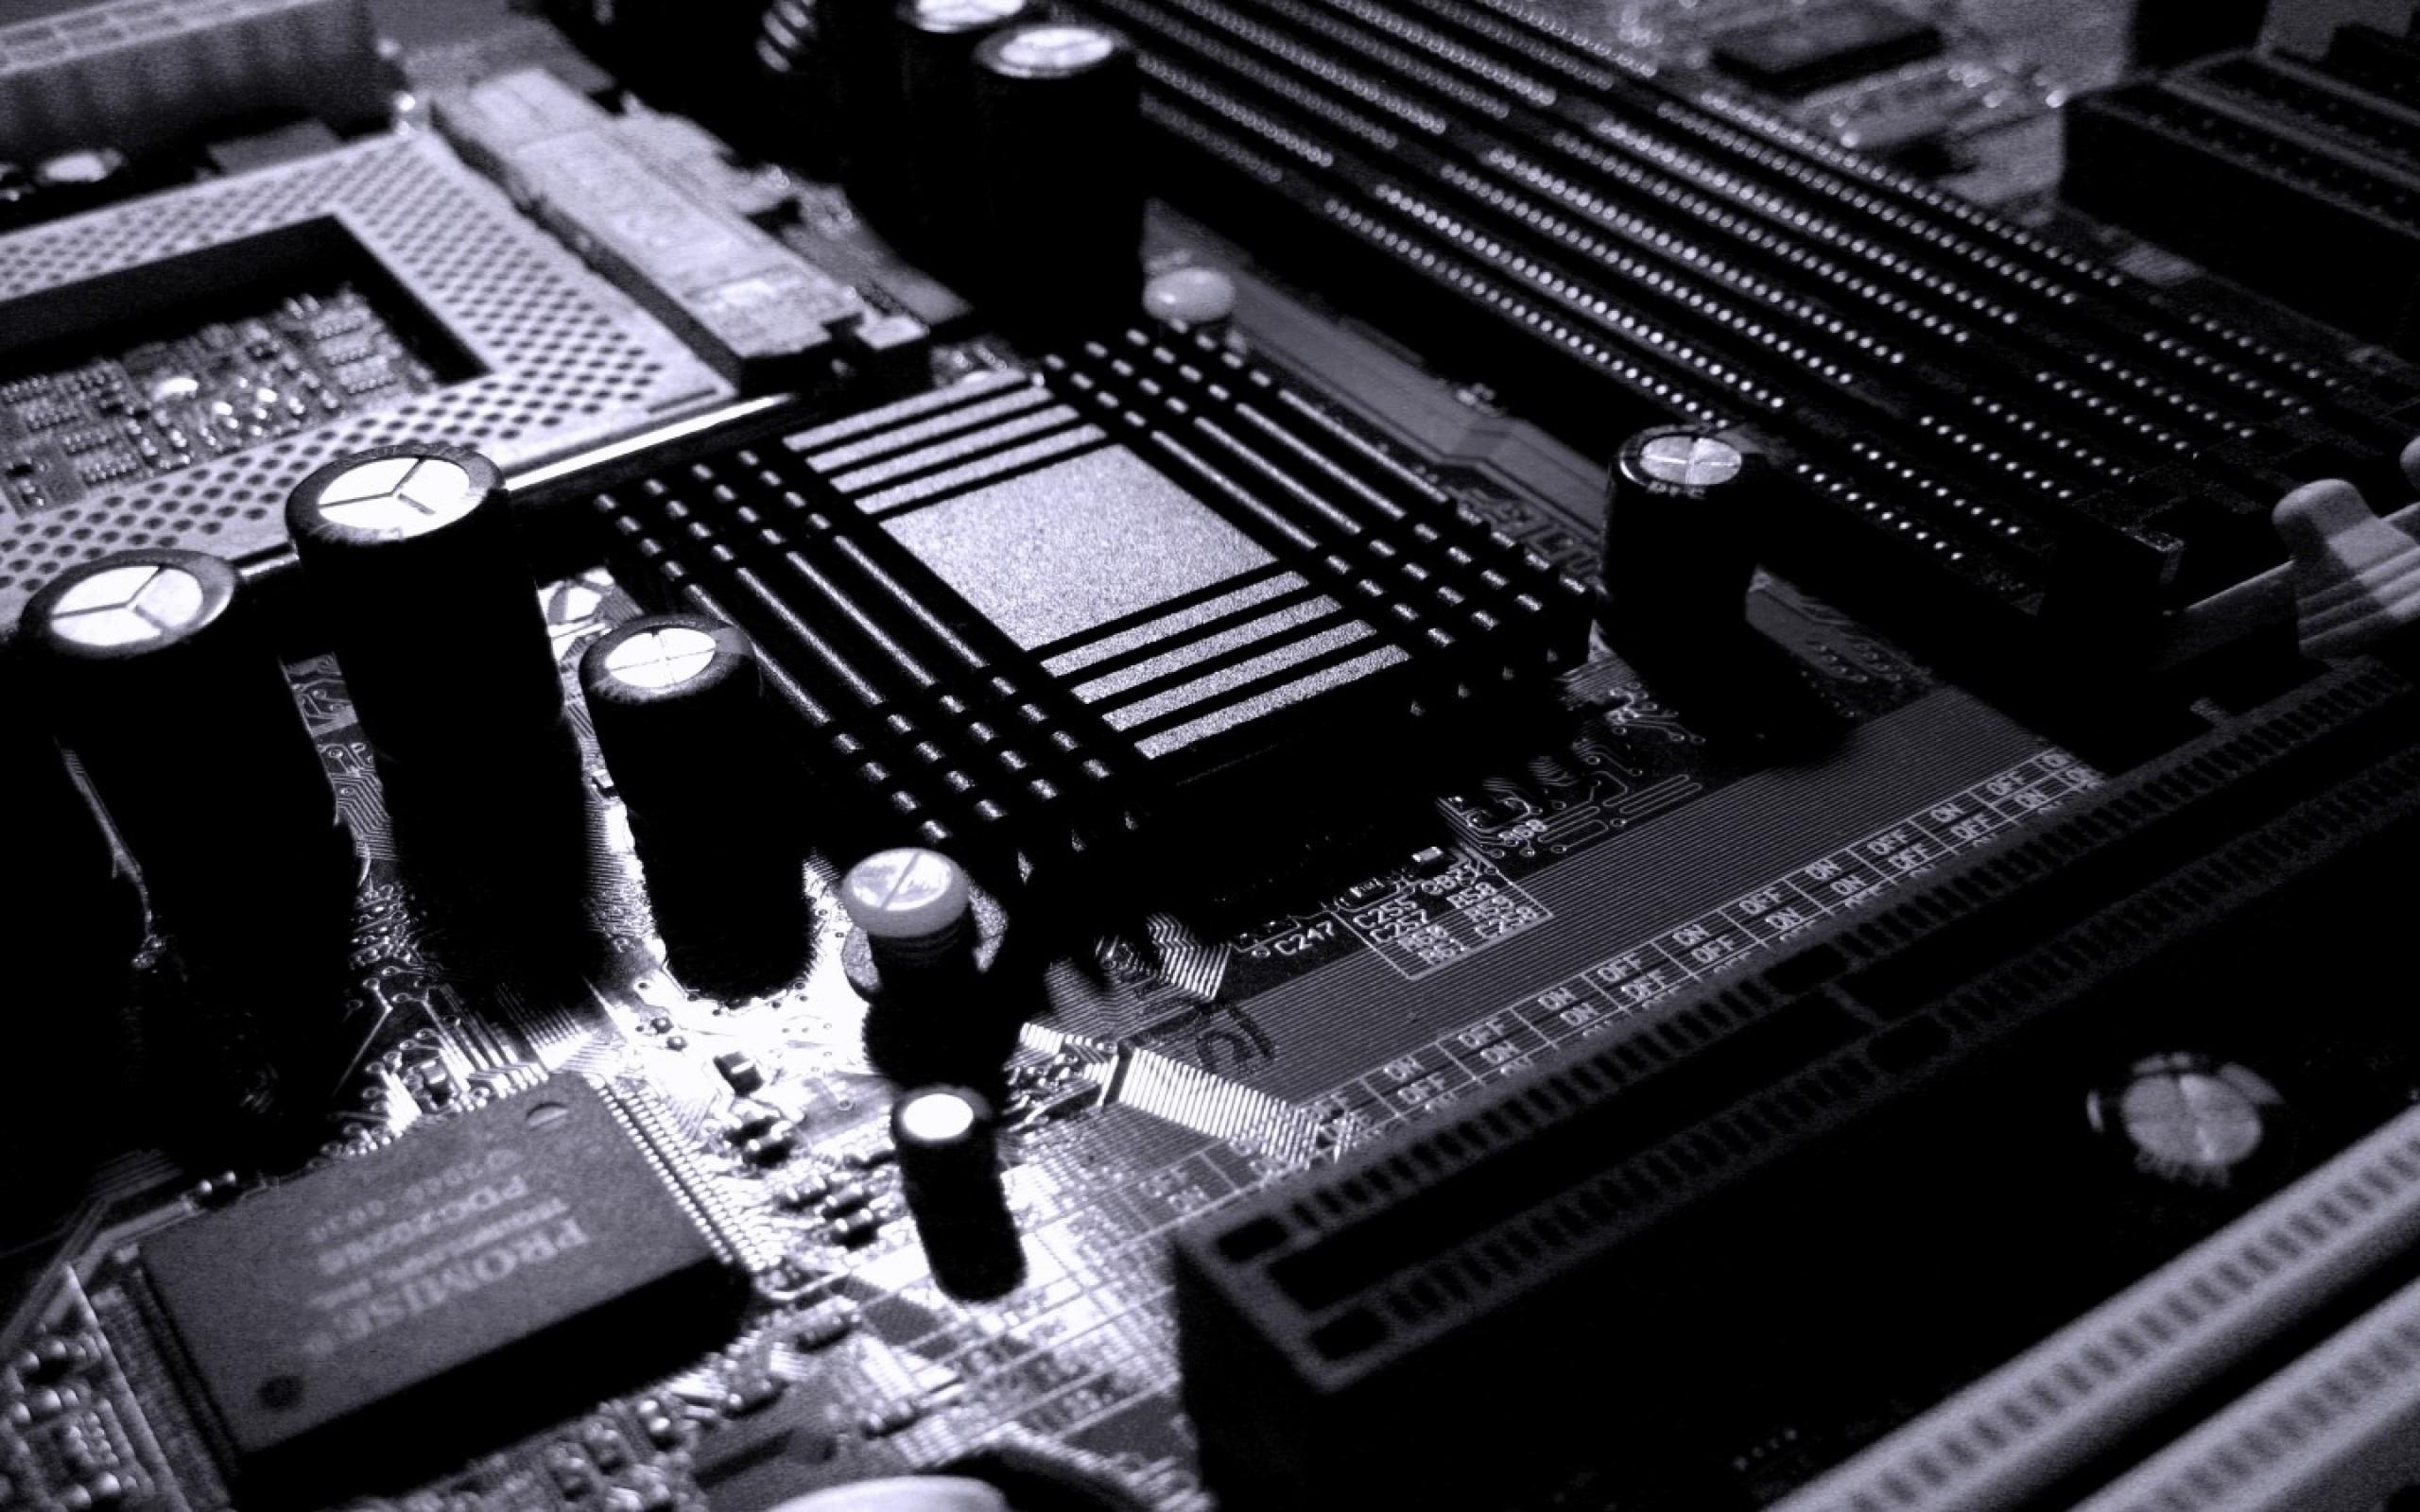 Weekly Wallpaper: Peek Inside Your Computer | Lifehacker .